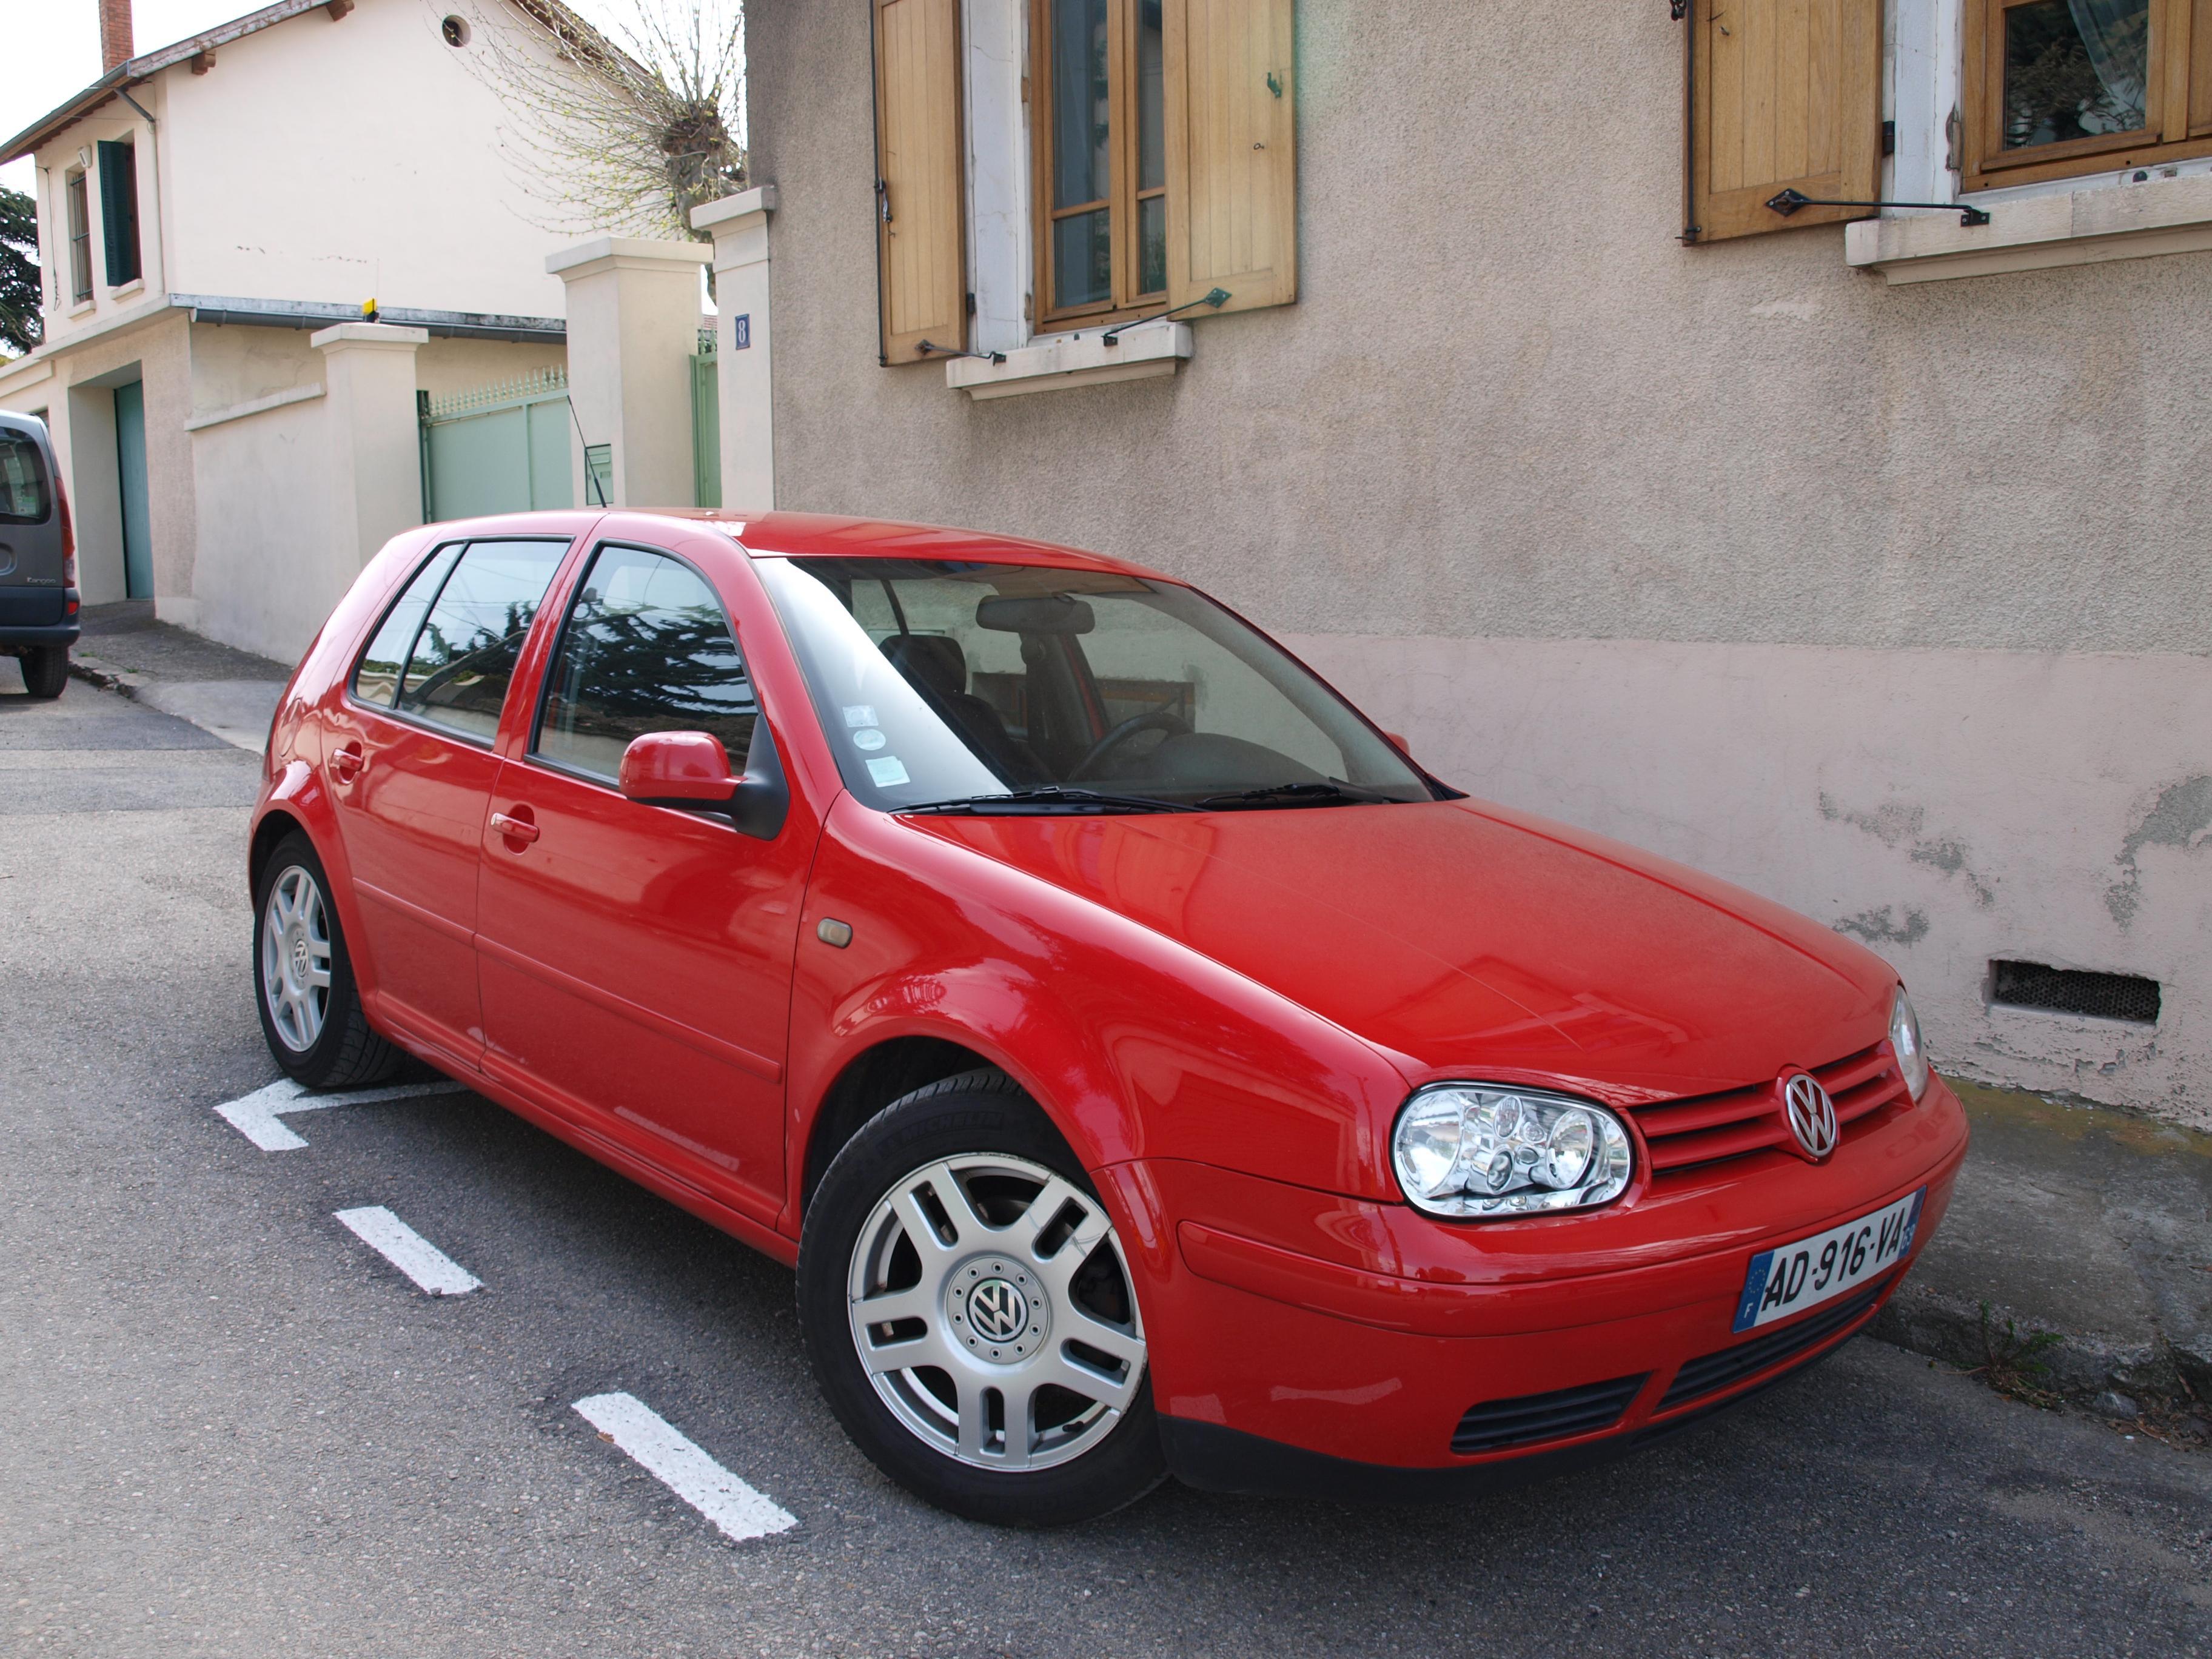 Golf4 gti de christophe ann e 1998 garage des for Garage volkswagen lyon